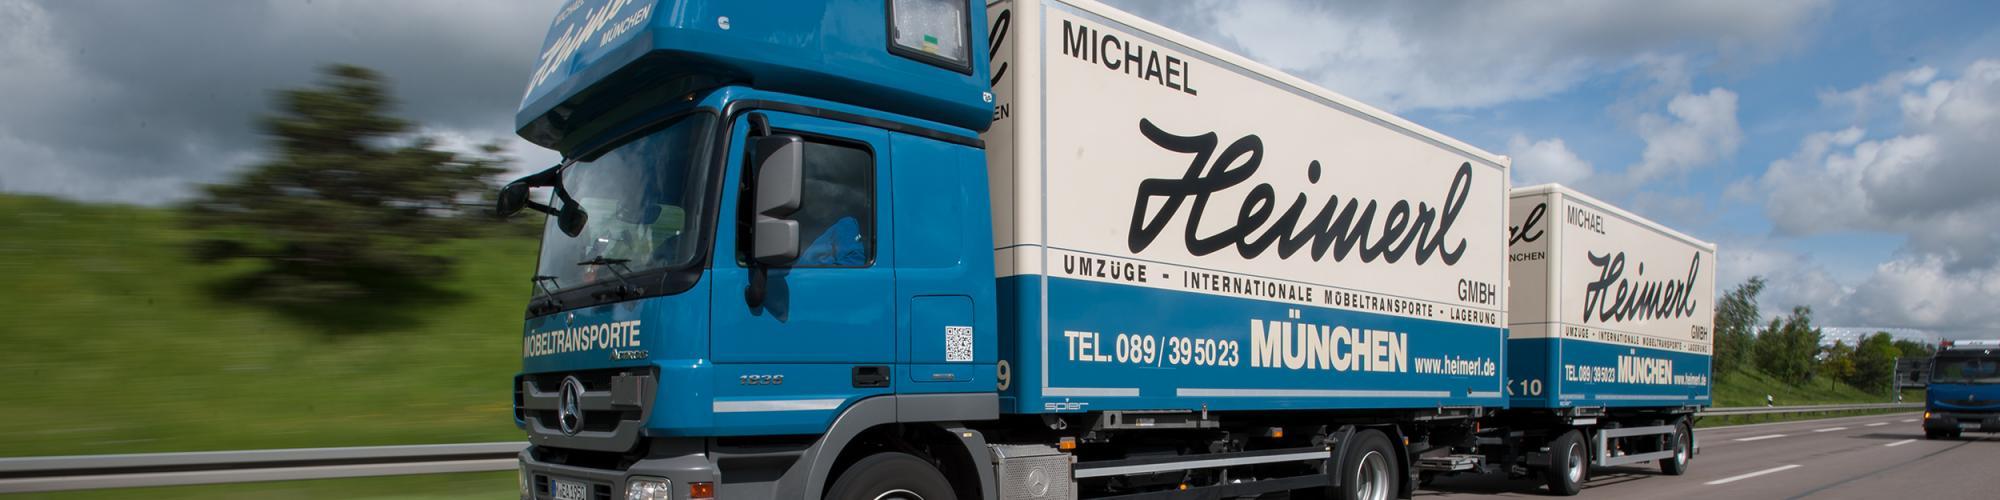 Michael Heimerl GmbH | Jobbörse meinestelle.de